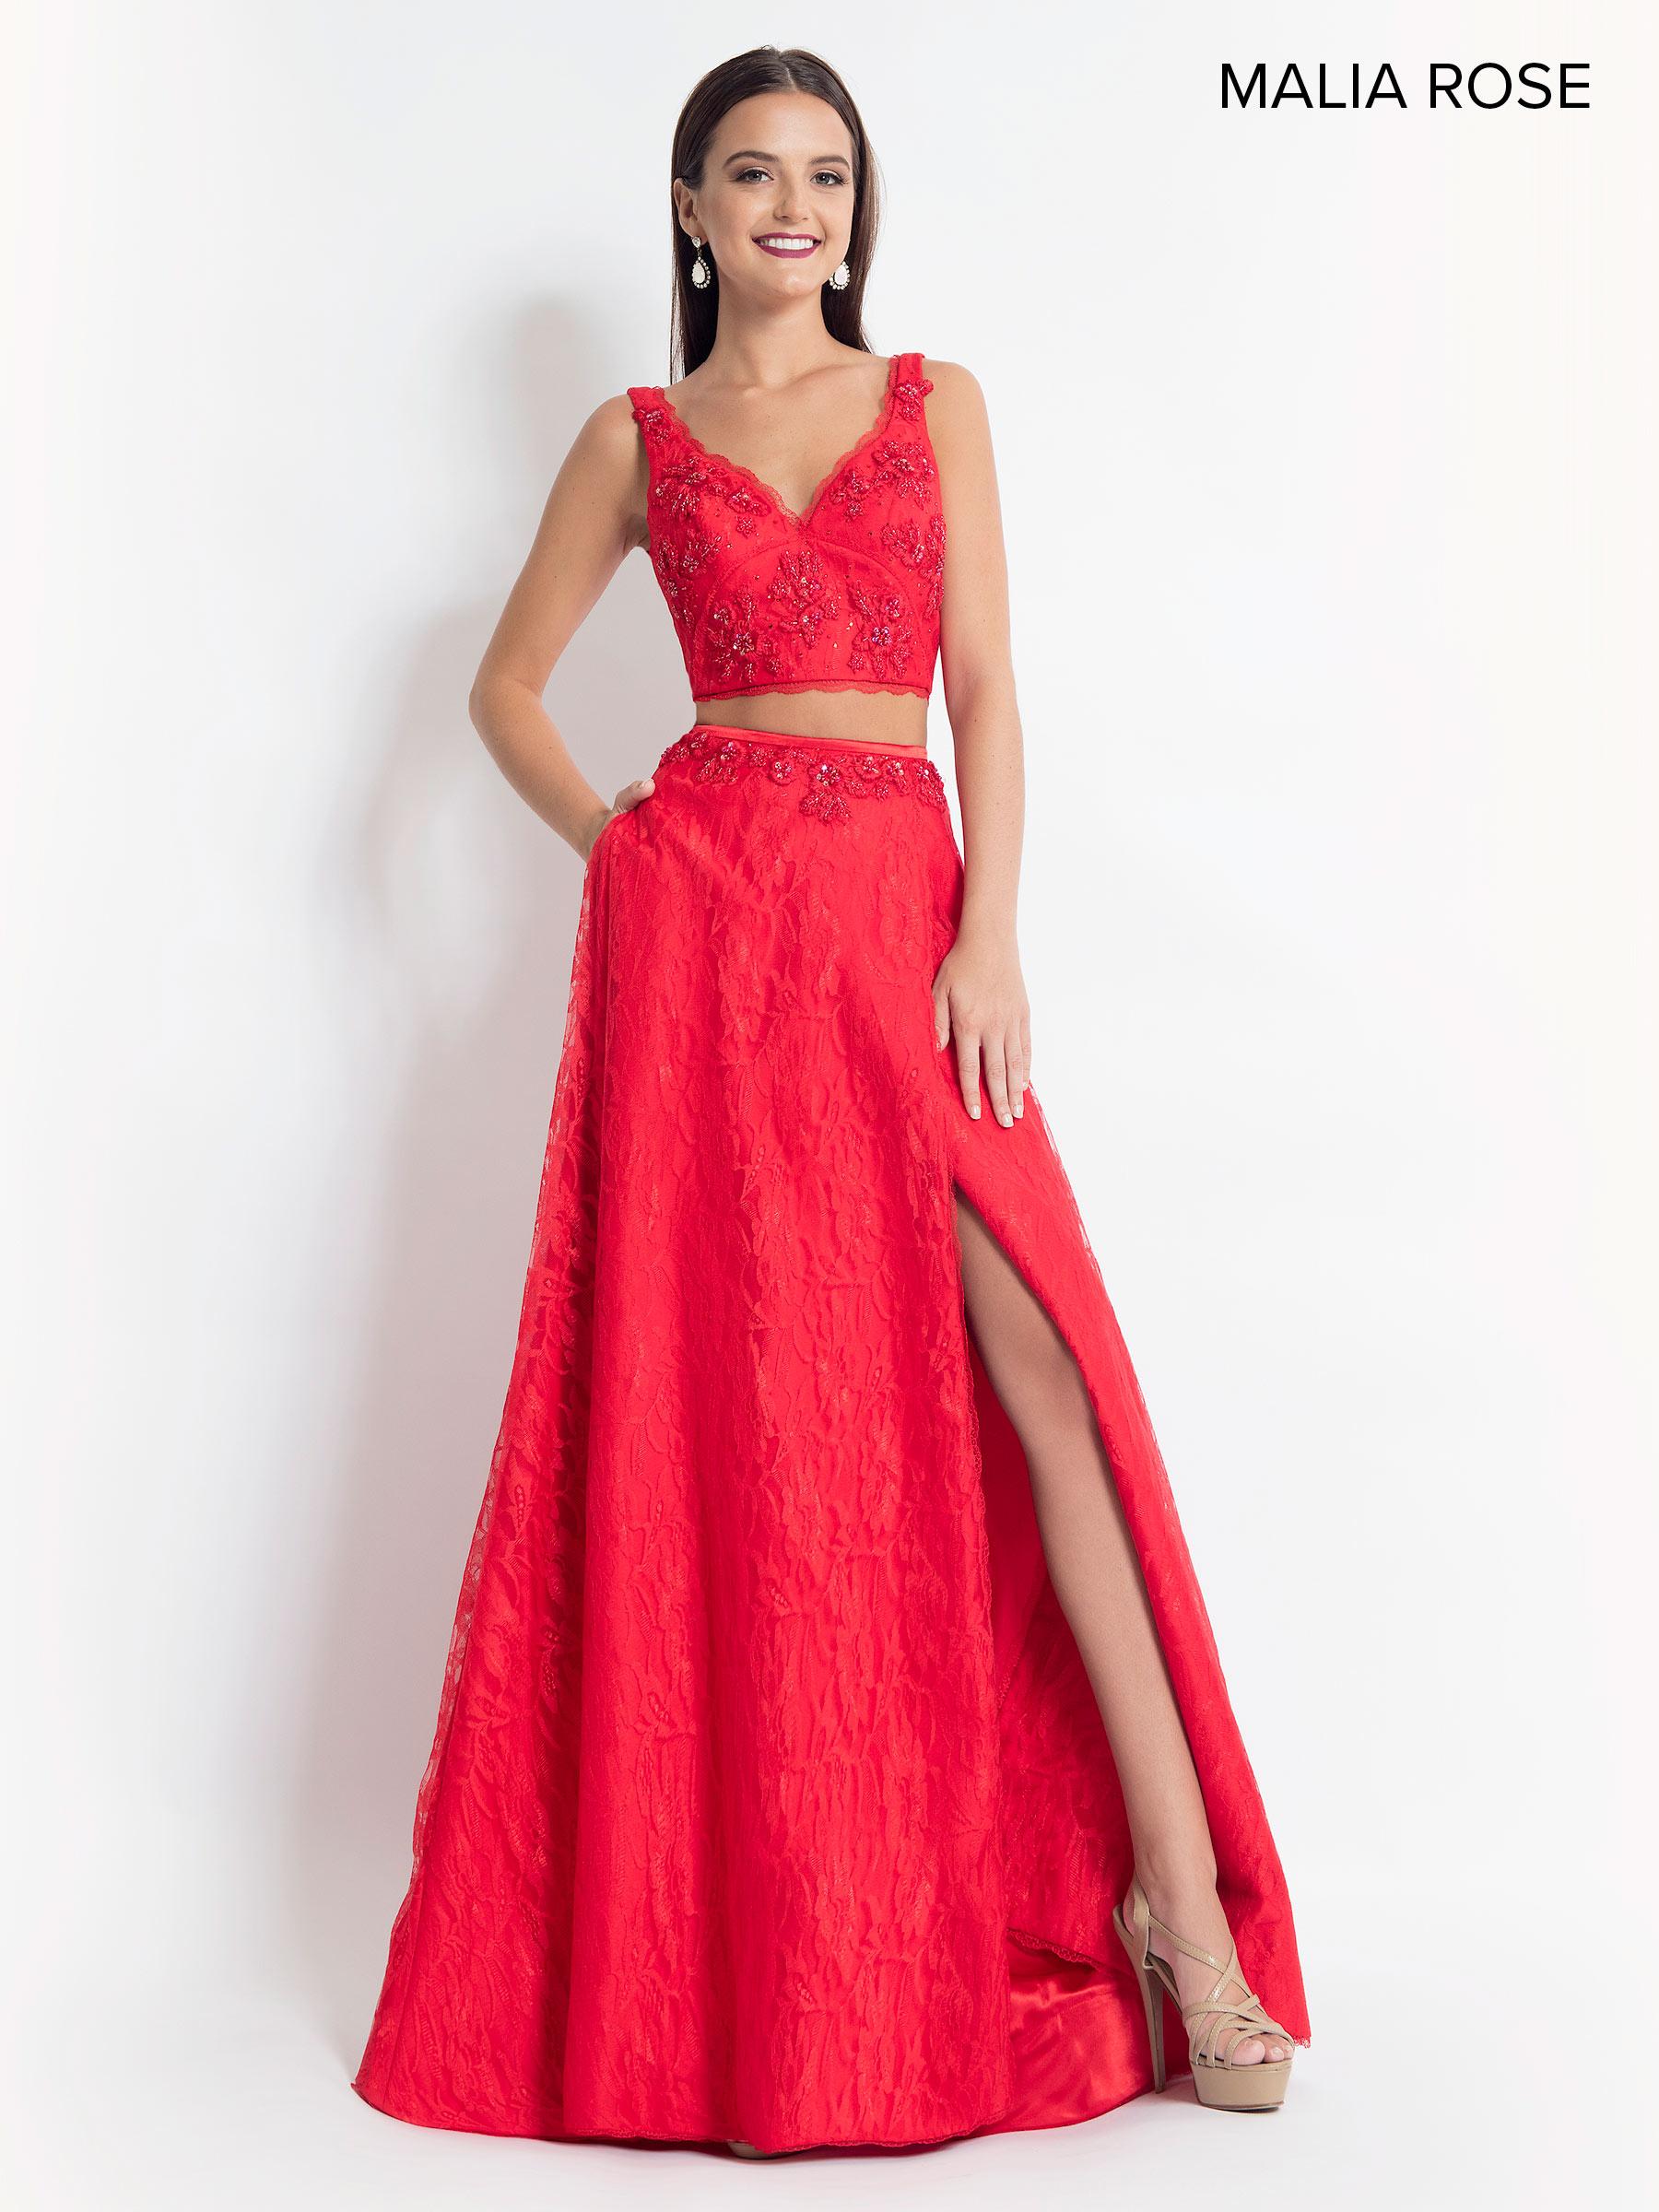 81f83e5558 Black Top Red Skirt Prom Dress - Gomes Weine AG